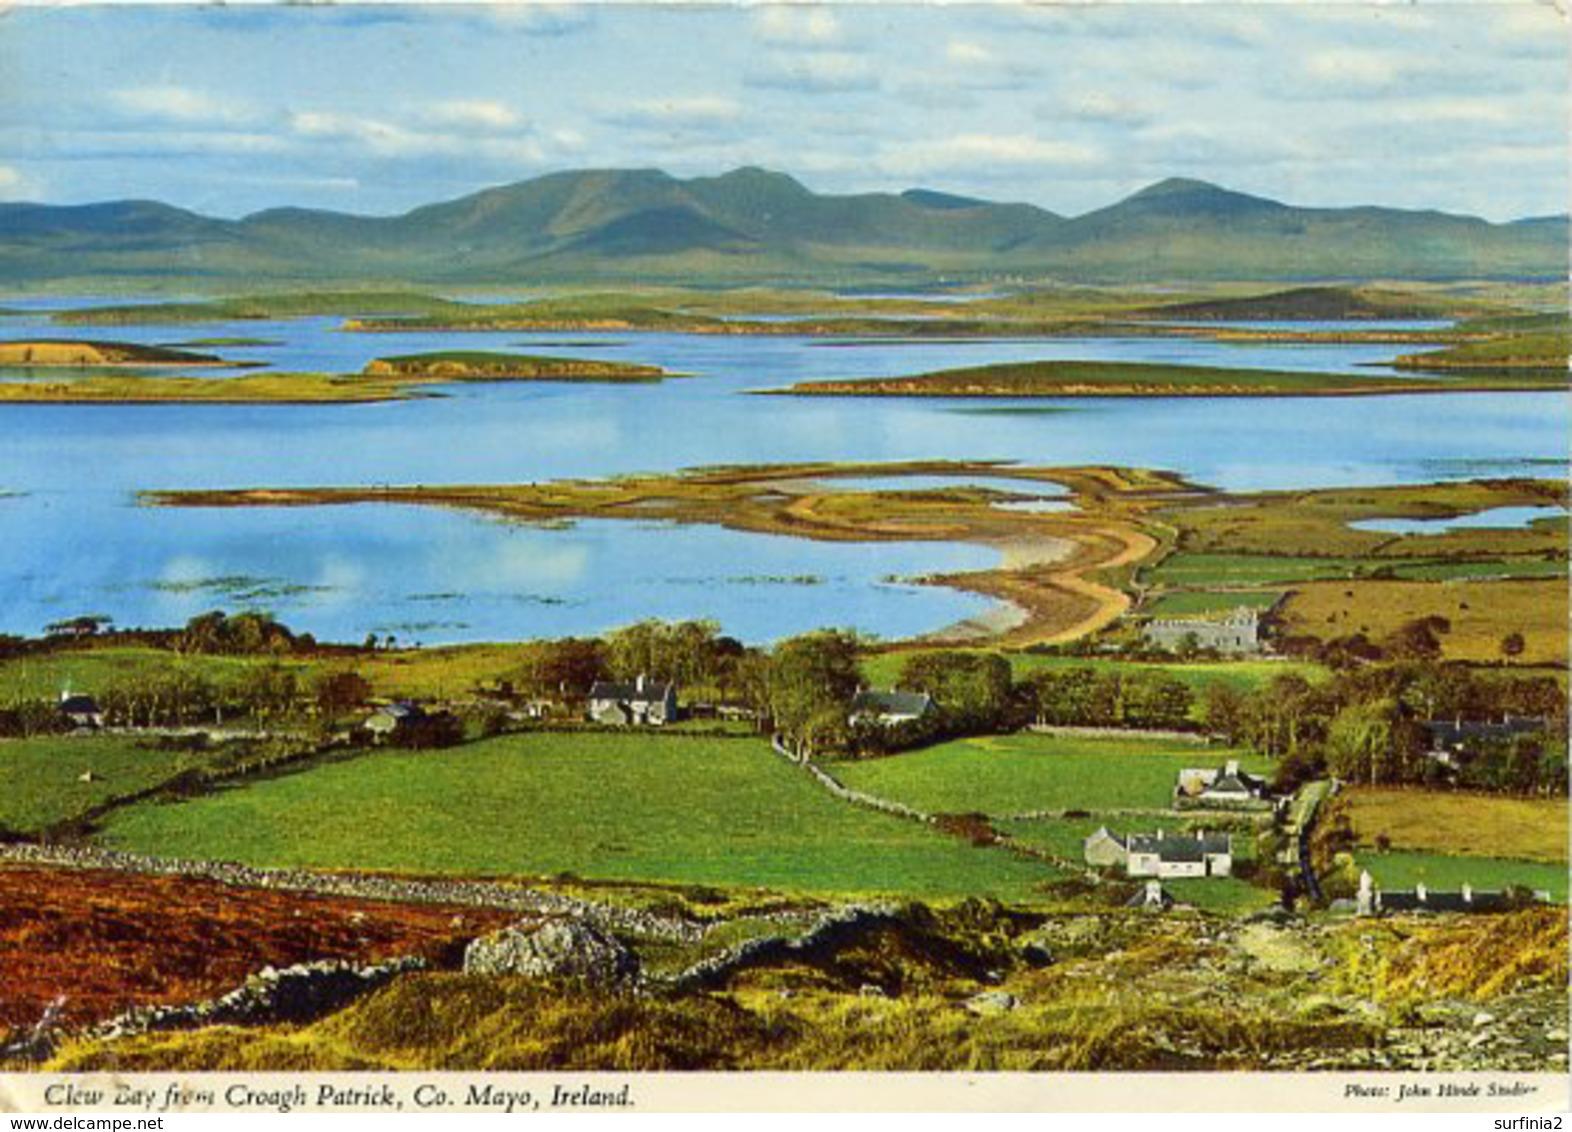 IRELAND - MAYO - CLEW BAY FROM CROAGH PATRICK - JOHN HINDE  Mc58 - Mayo